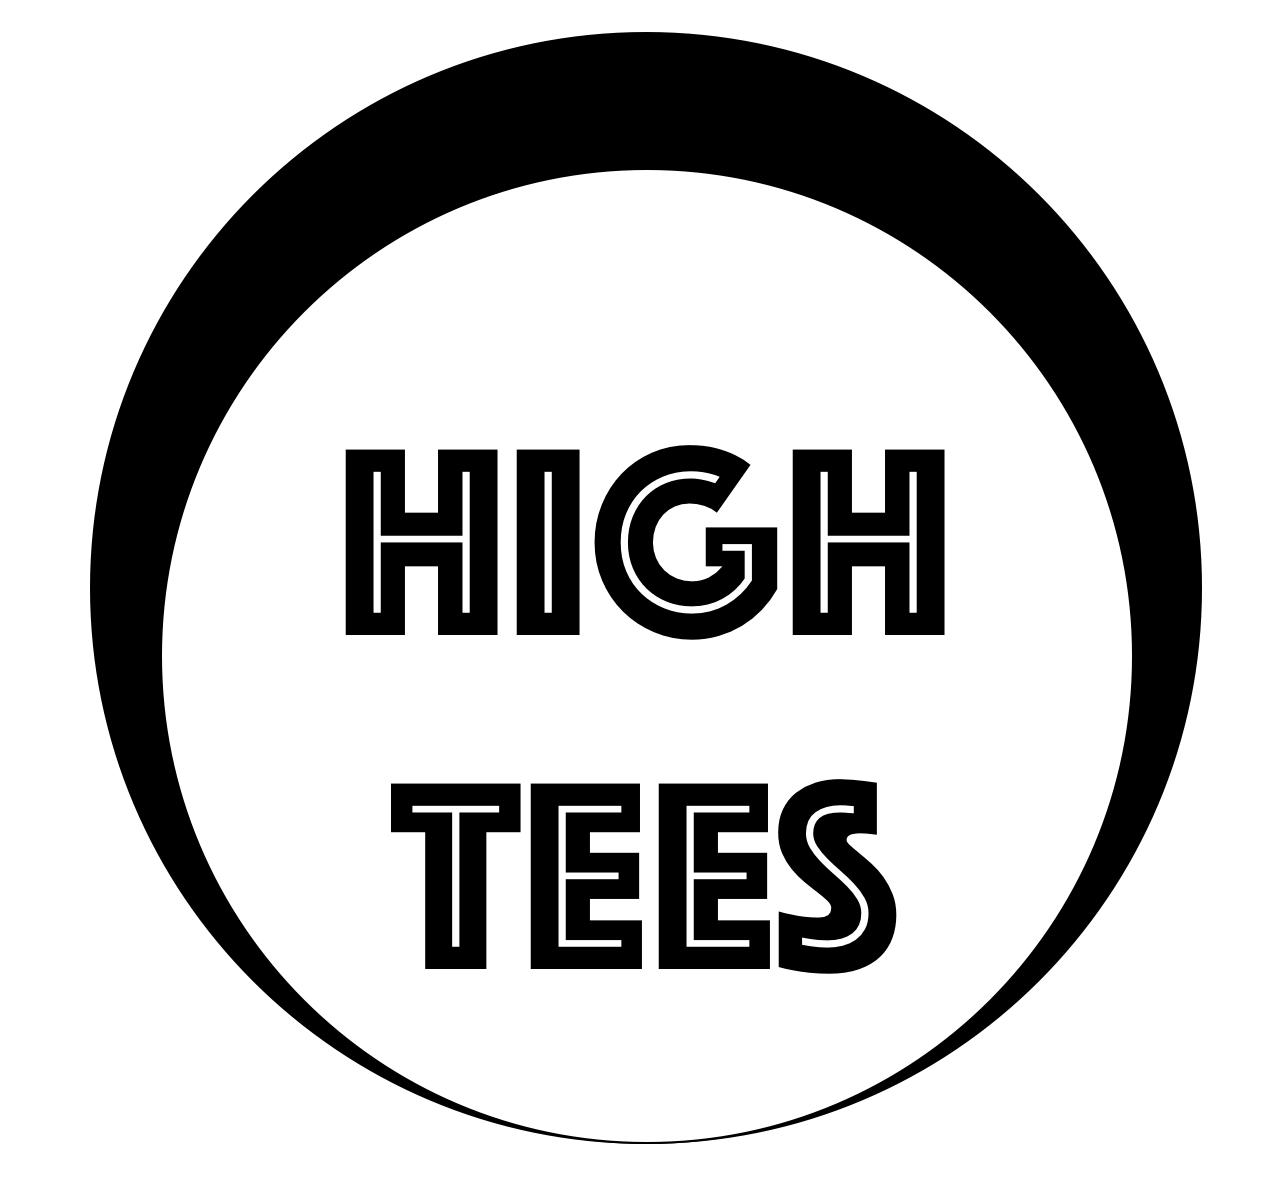 High Tees